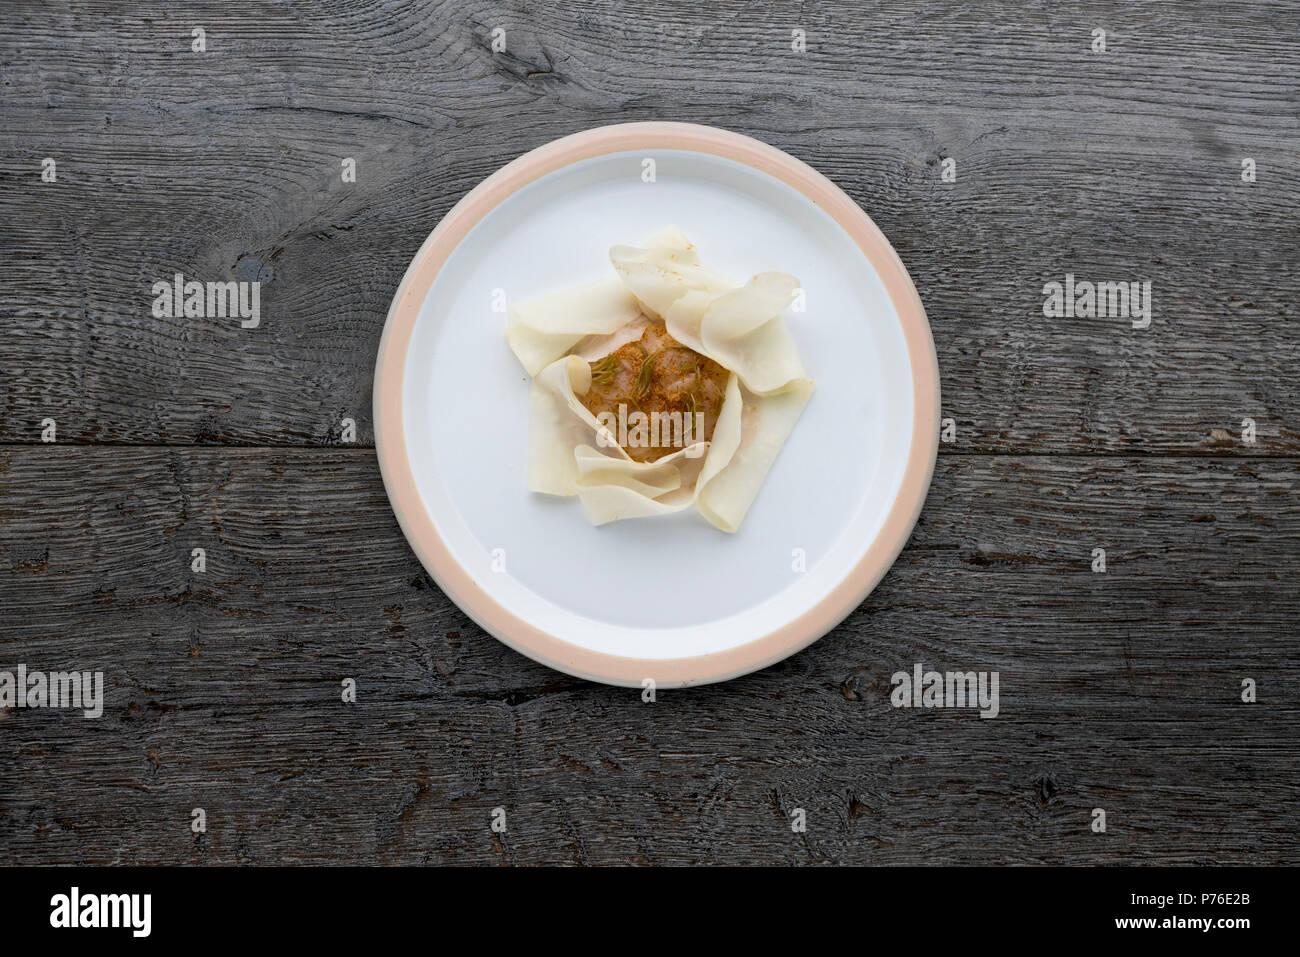 Musling, restaurant Copenhagen - Stock Image